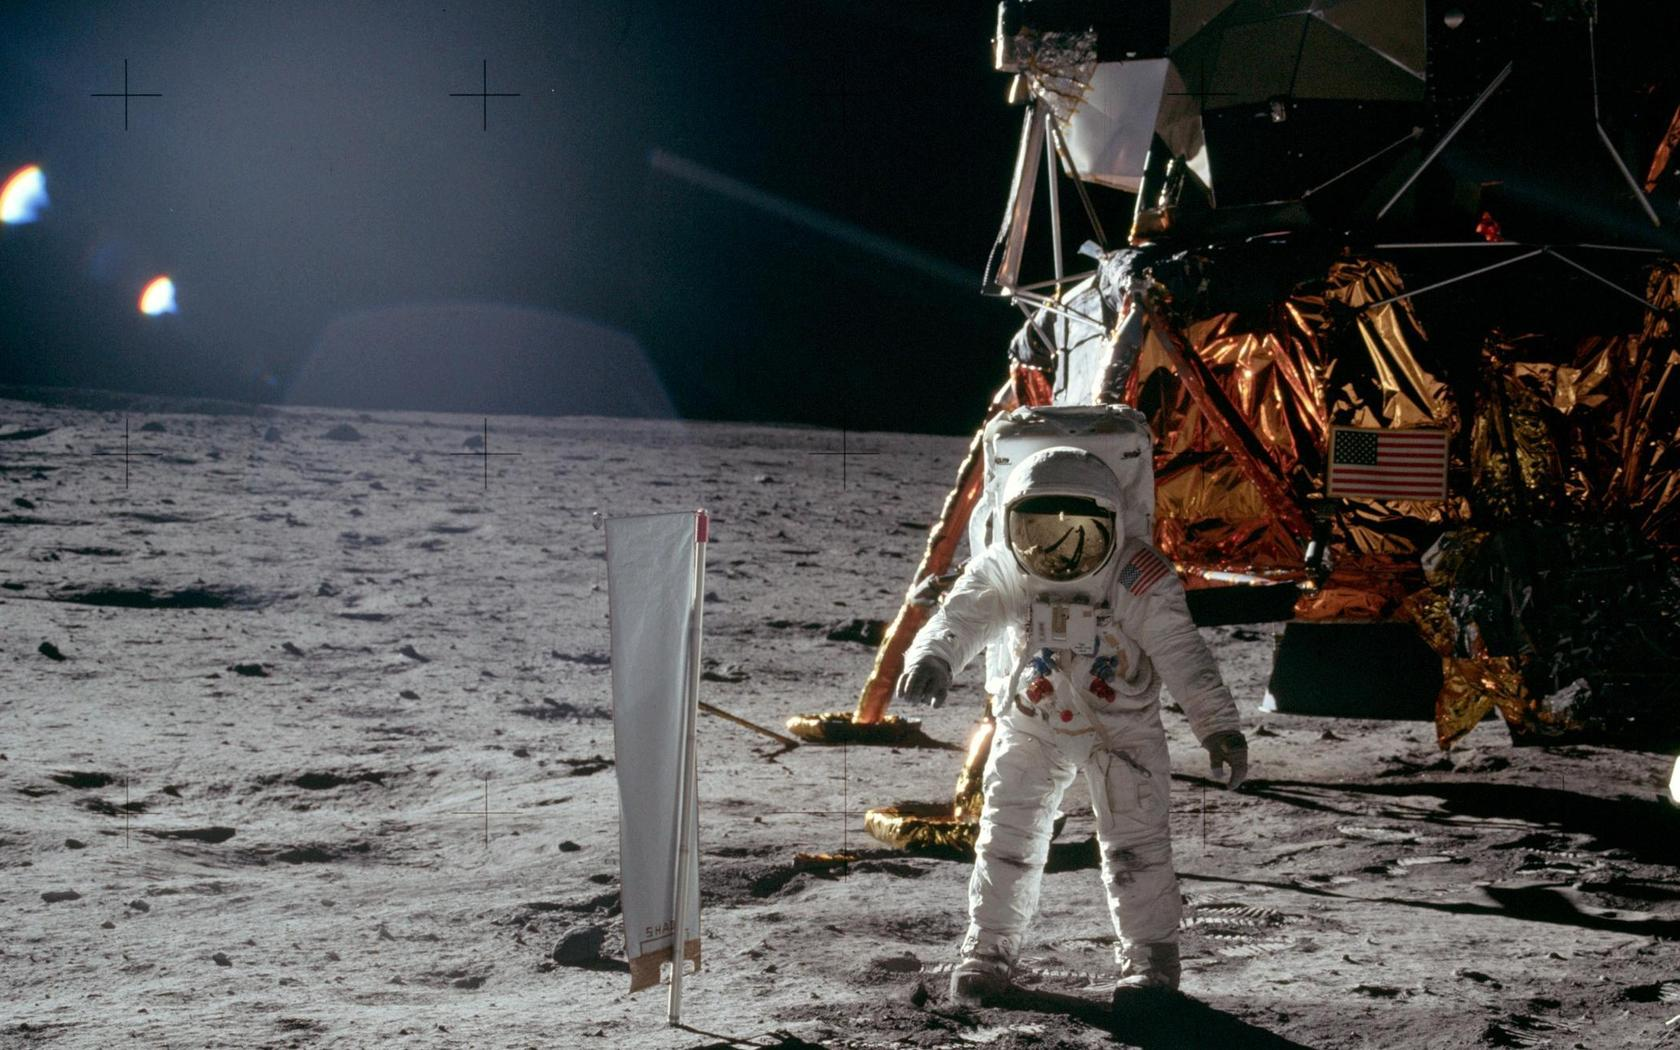 apollo_11_moon_landing